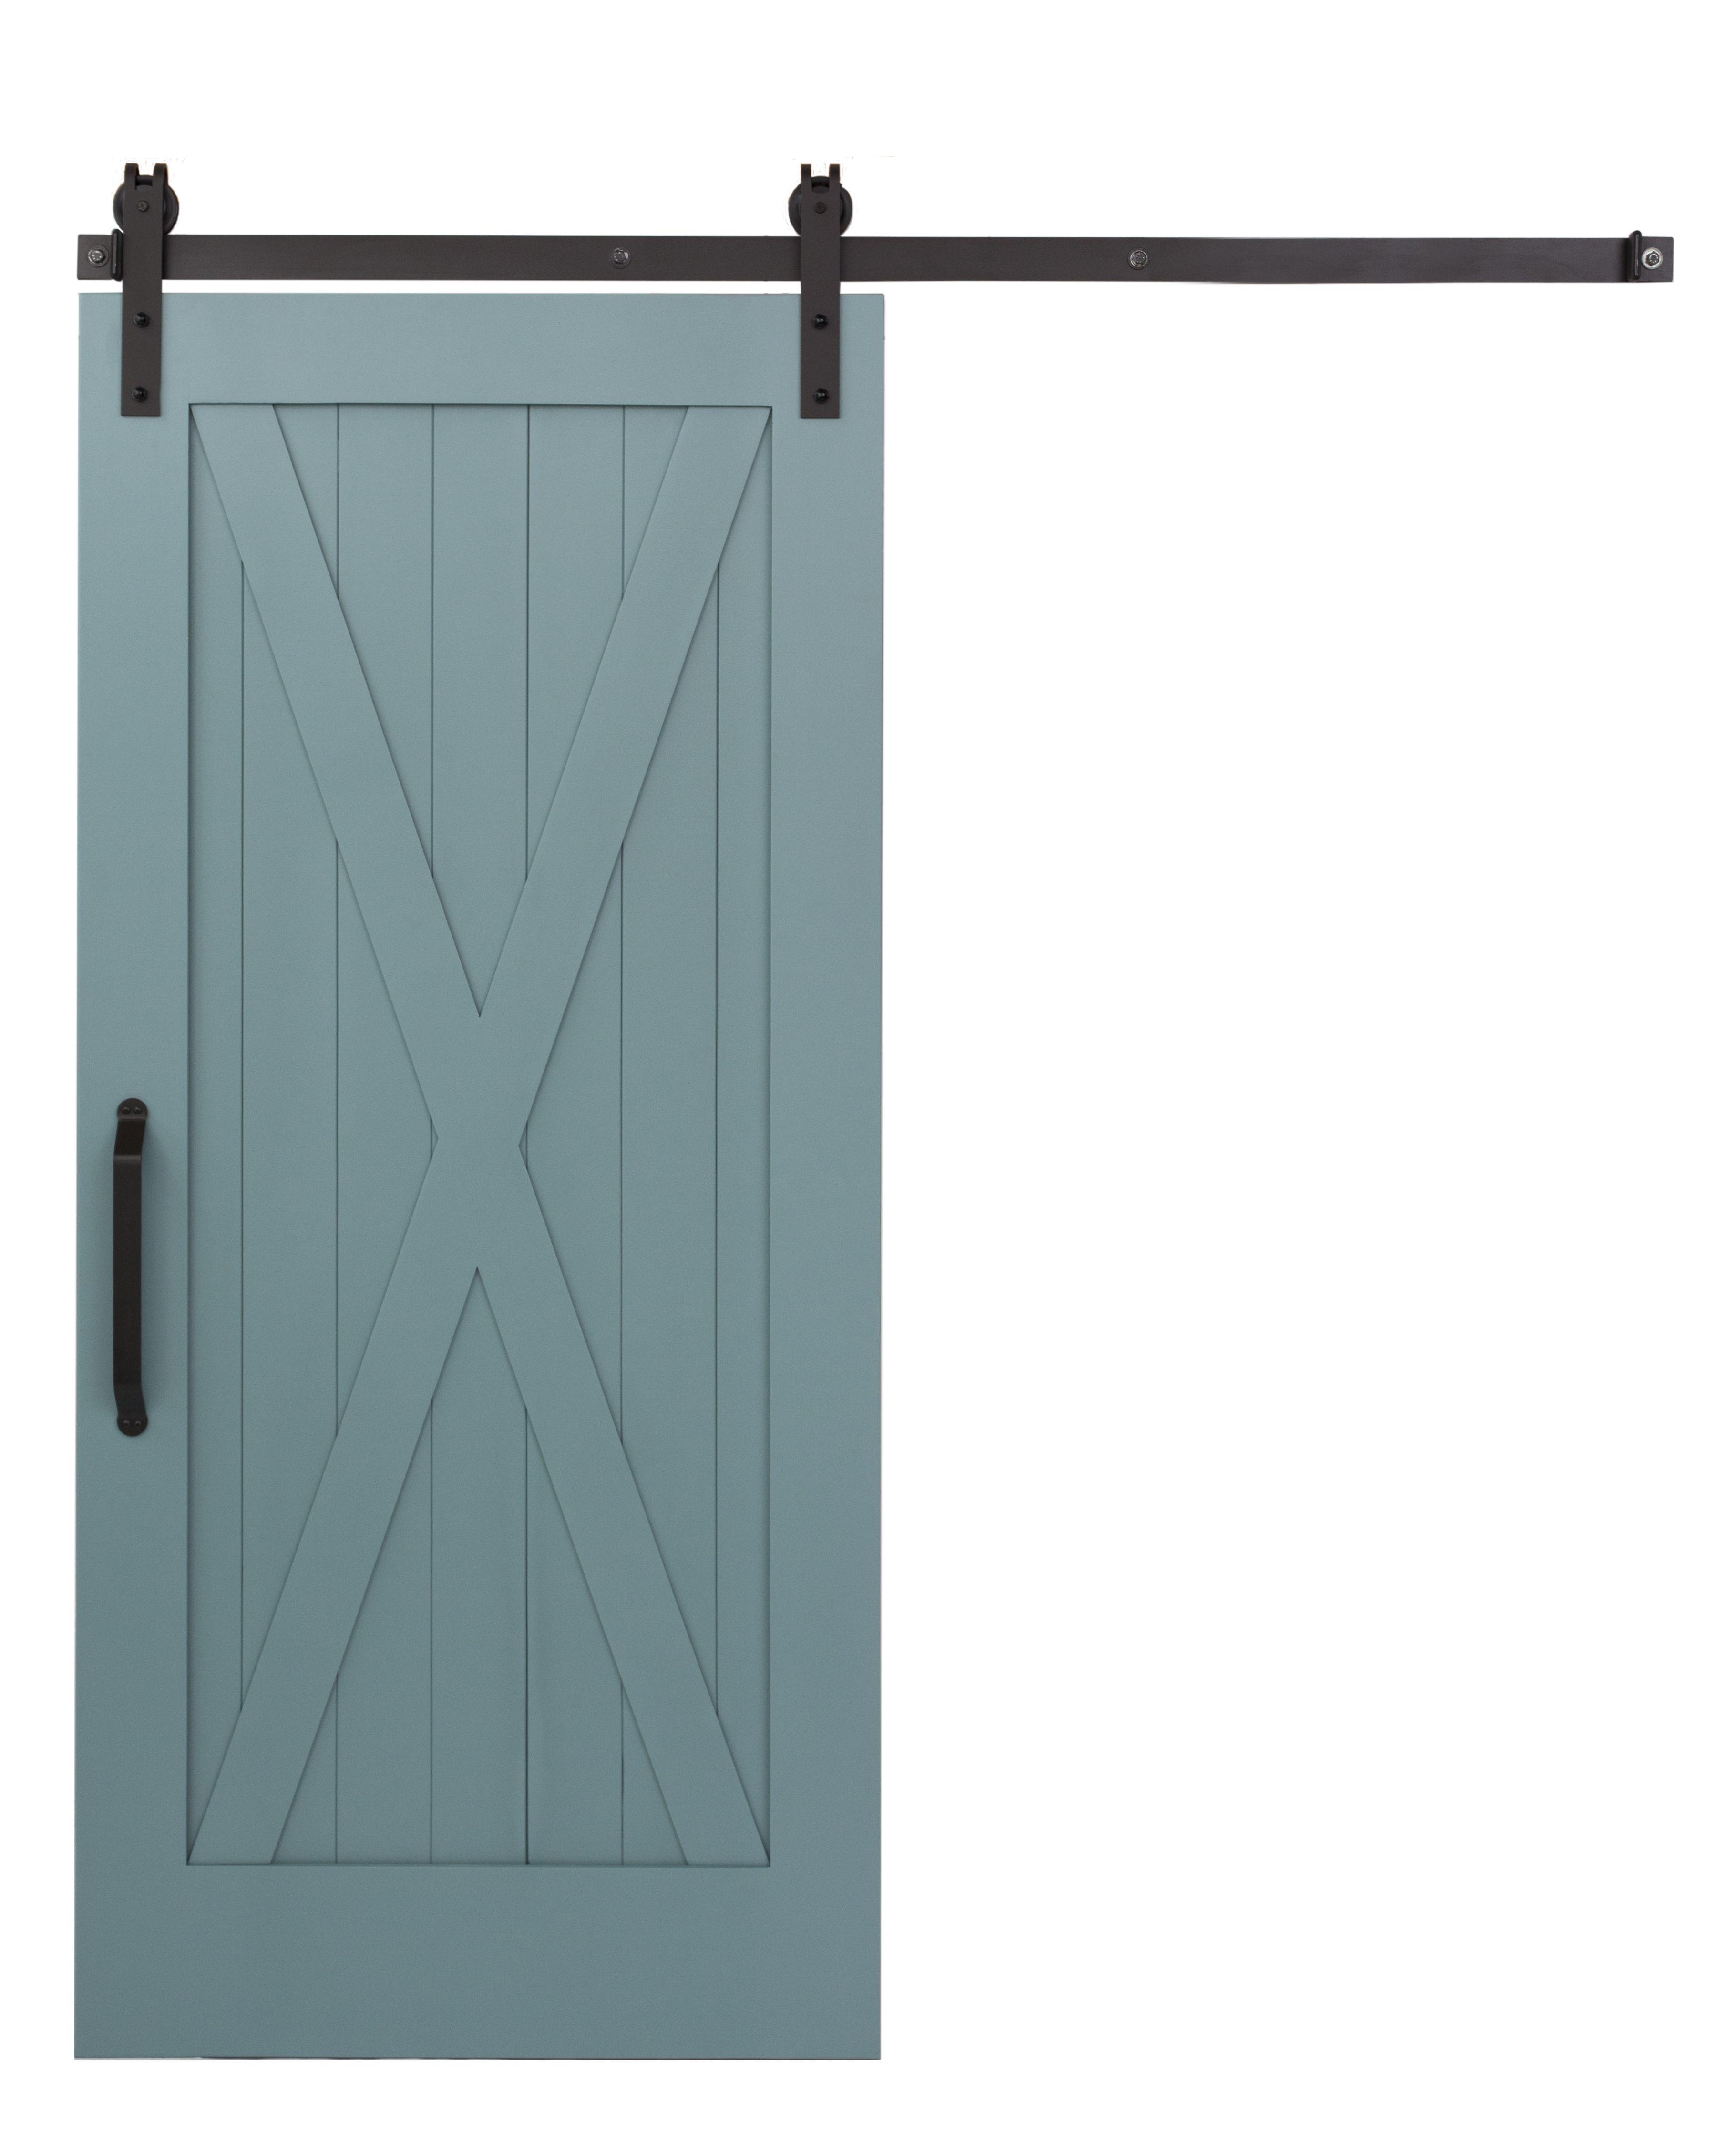 Teal And Blue Gray Full X Barn Door By Rustica Hardware Red Barn Door Interior Sliding Glass Doors Barn Doors Sliding